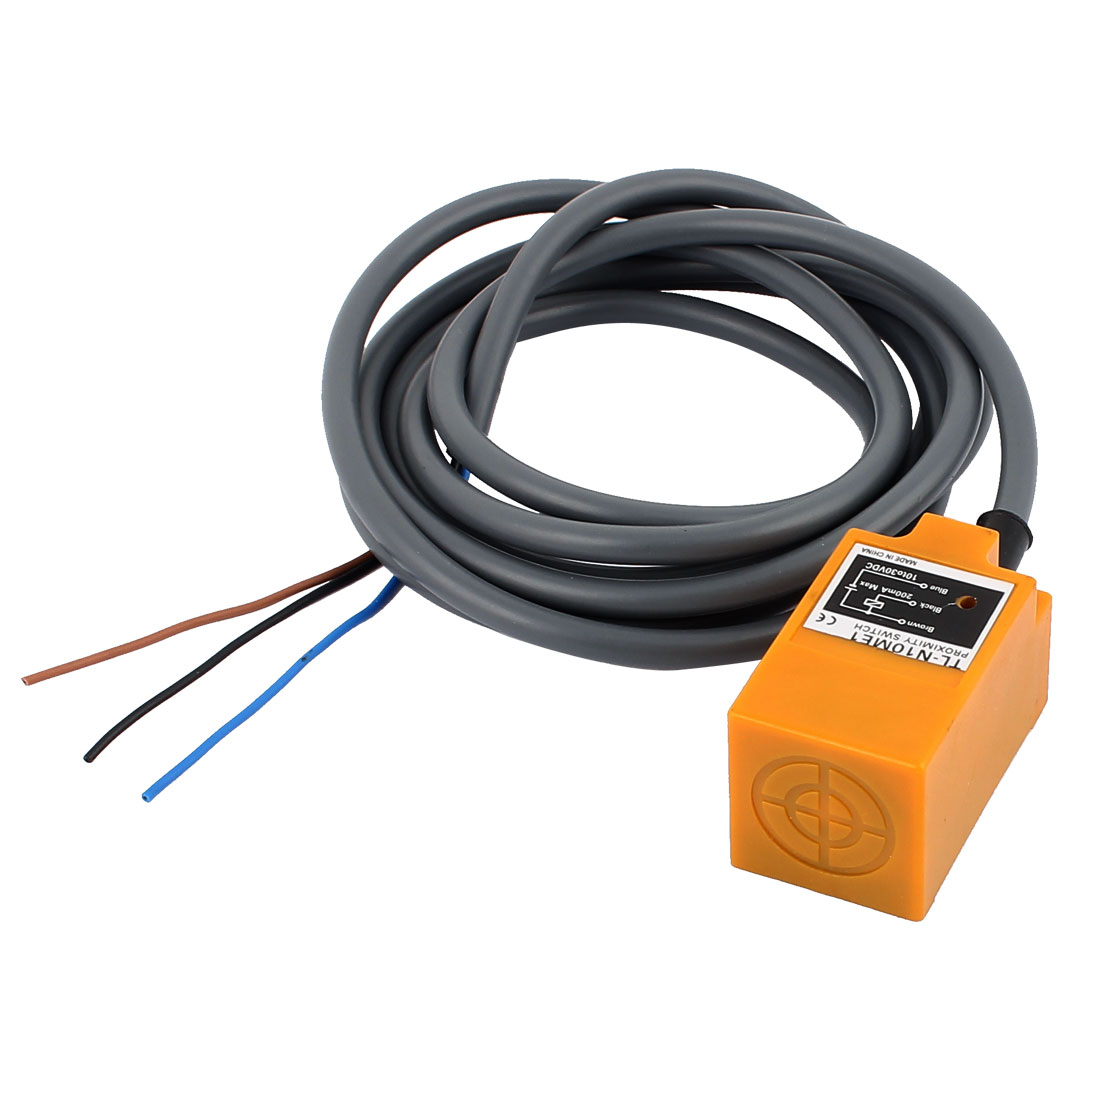 DC 10-30V 200mA 3 Wires NPN NO 10mm Inductive Proximity Sensor Switch TL-N10ME1